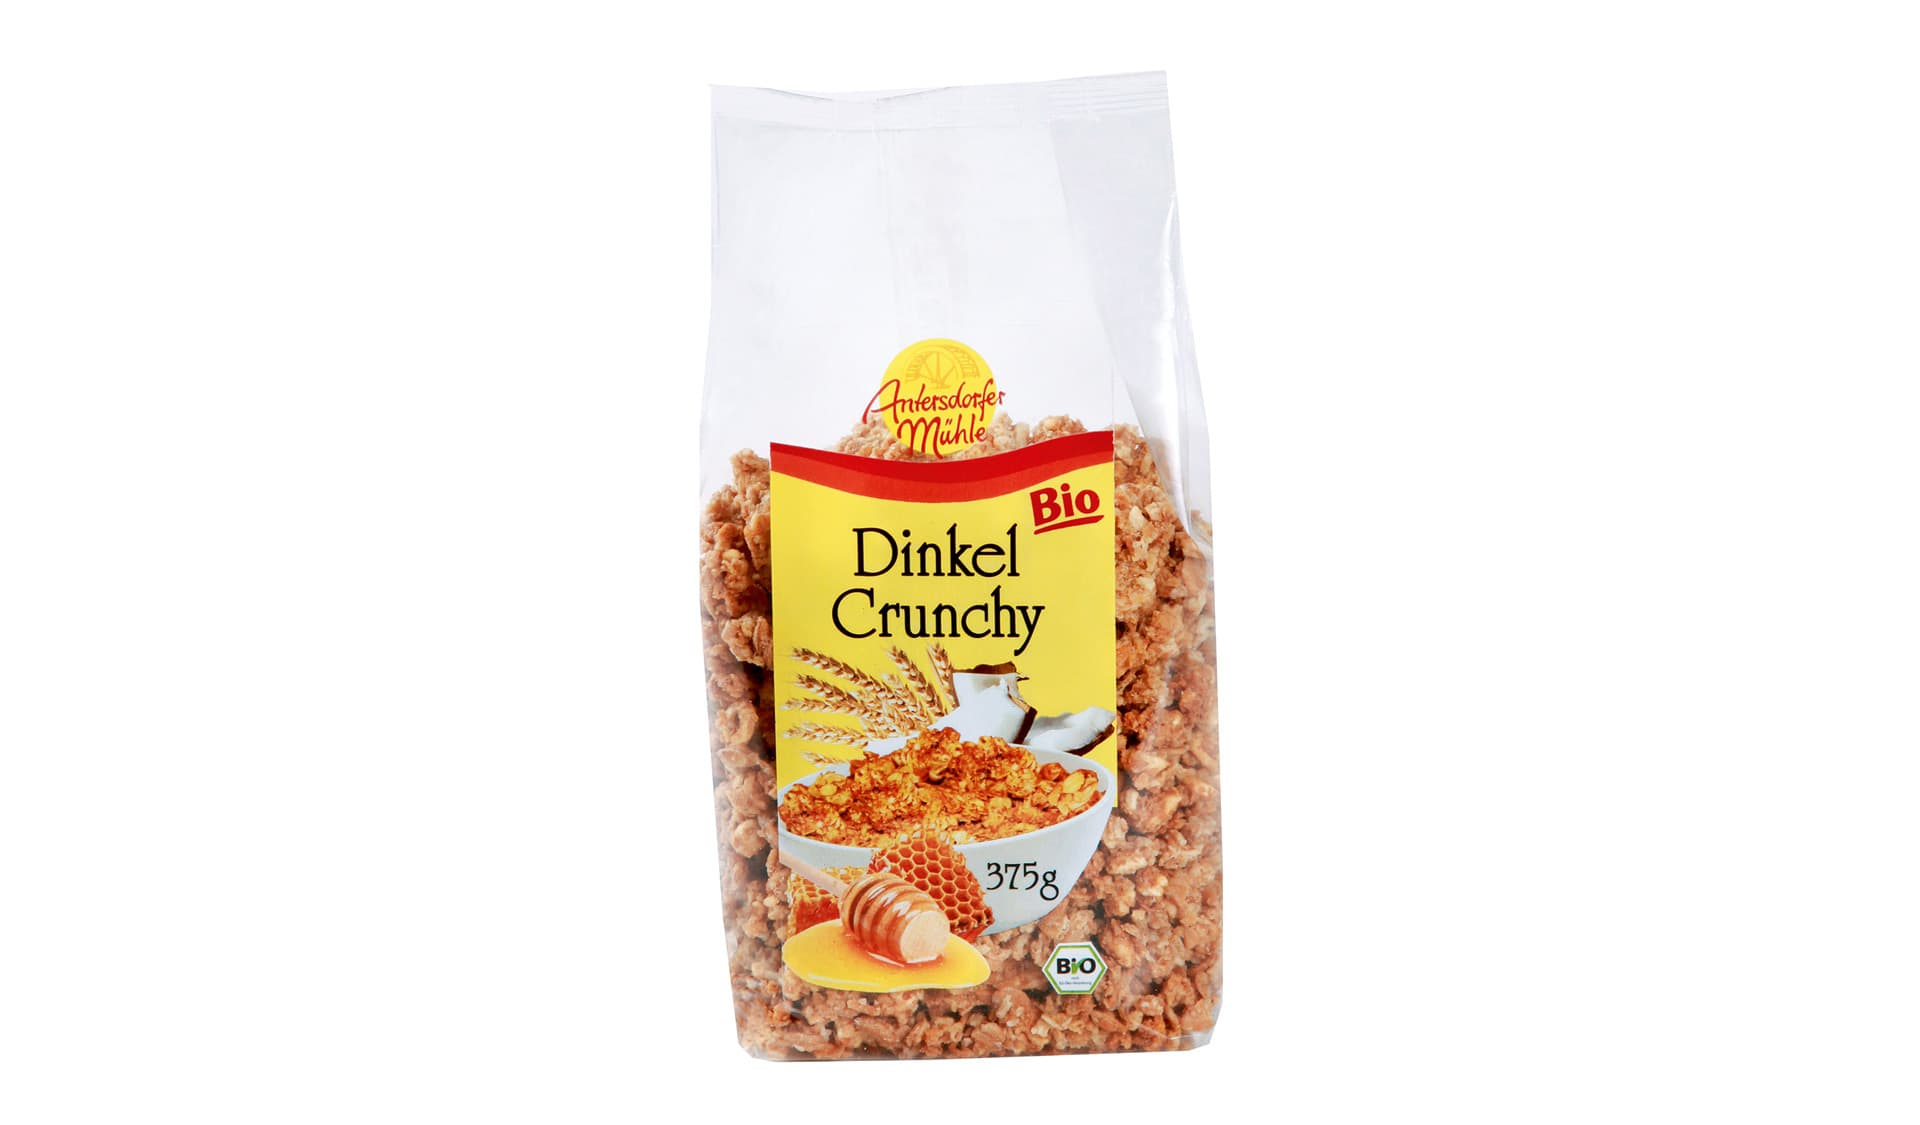 Antersdorfer Mühle (www.antersdorfer.bio) Dinkel Crunchy